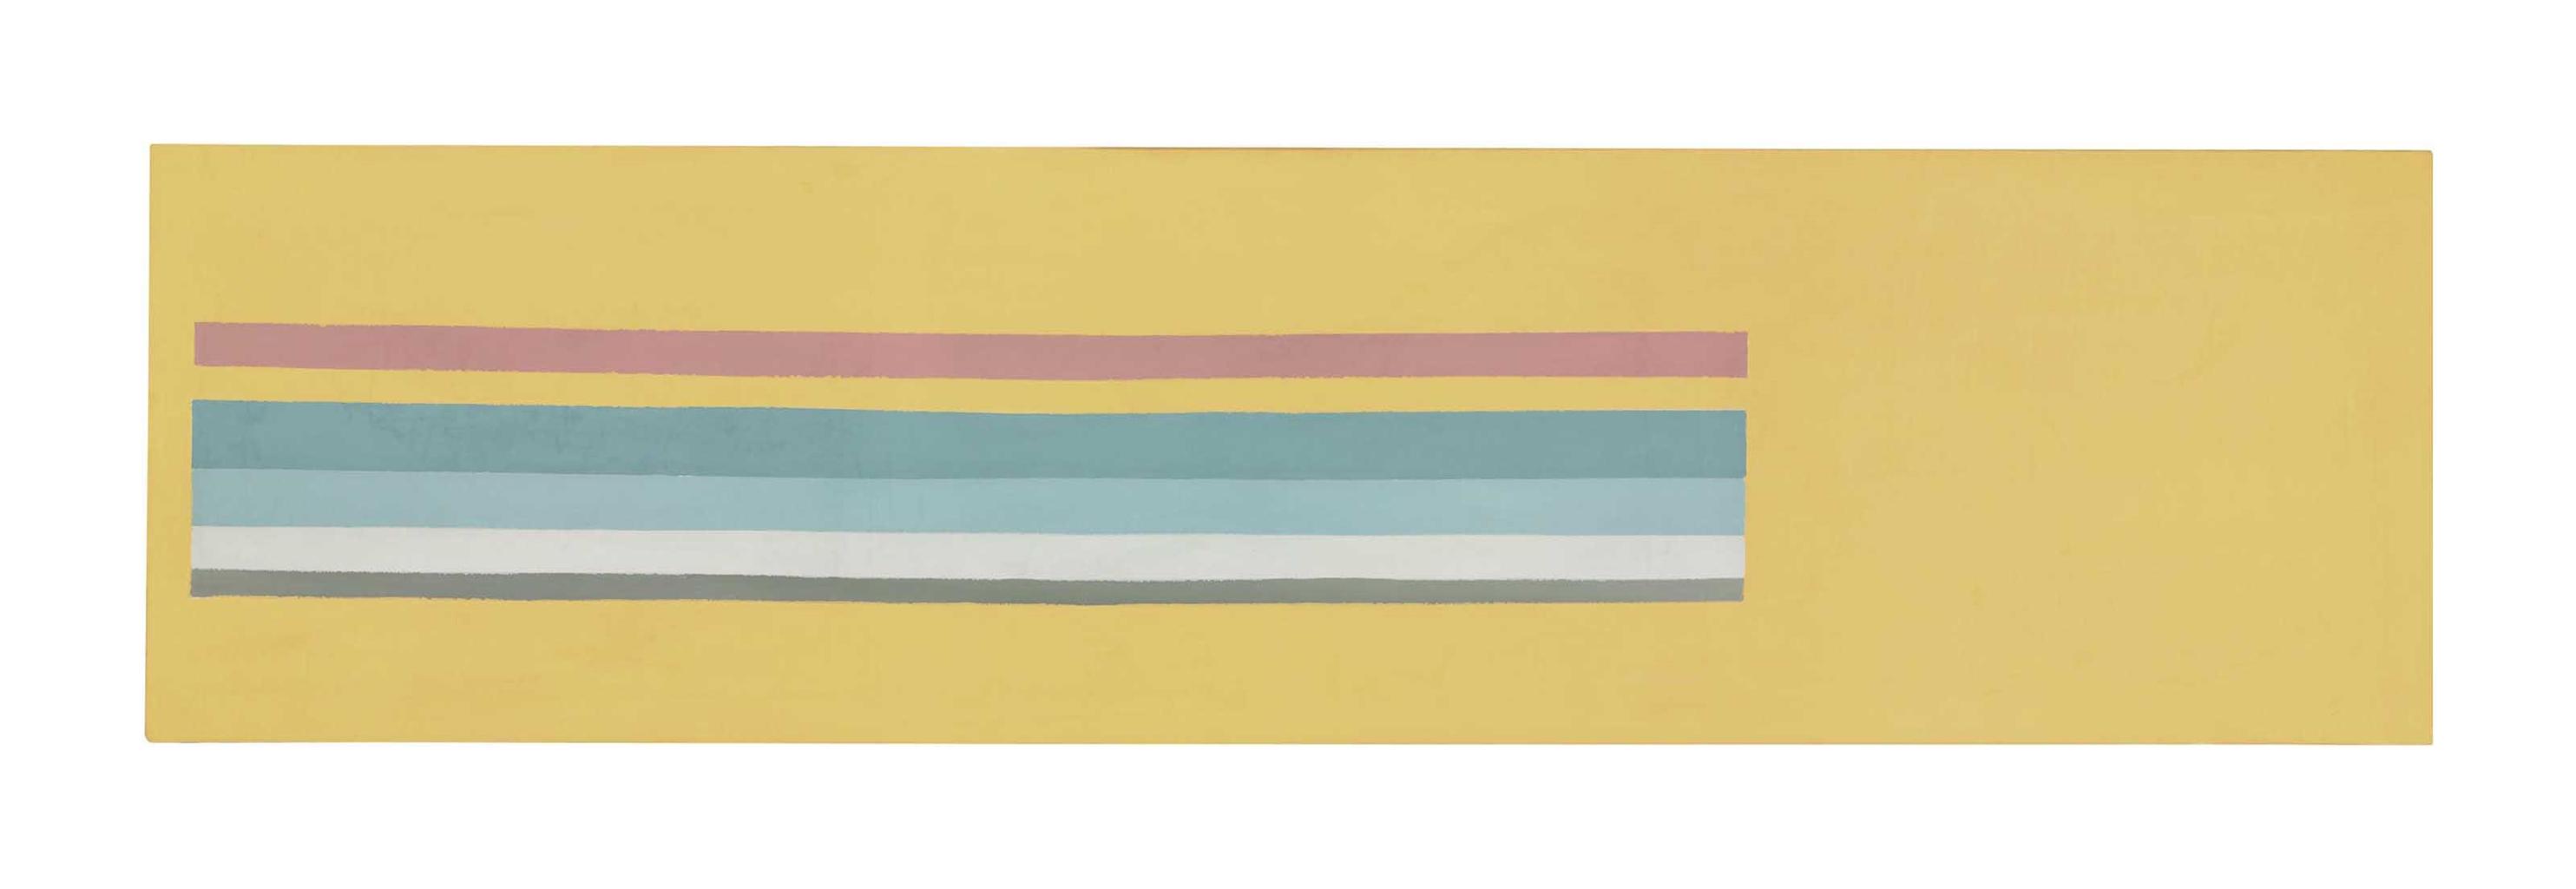 Theodoros Stamos-Corinthian Sun-Box-1968